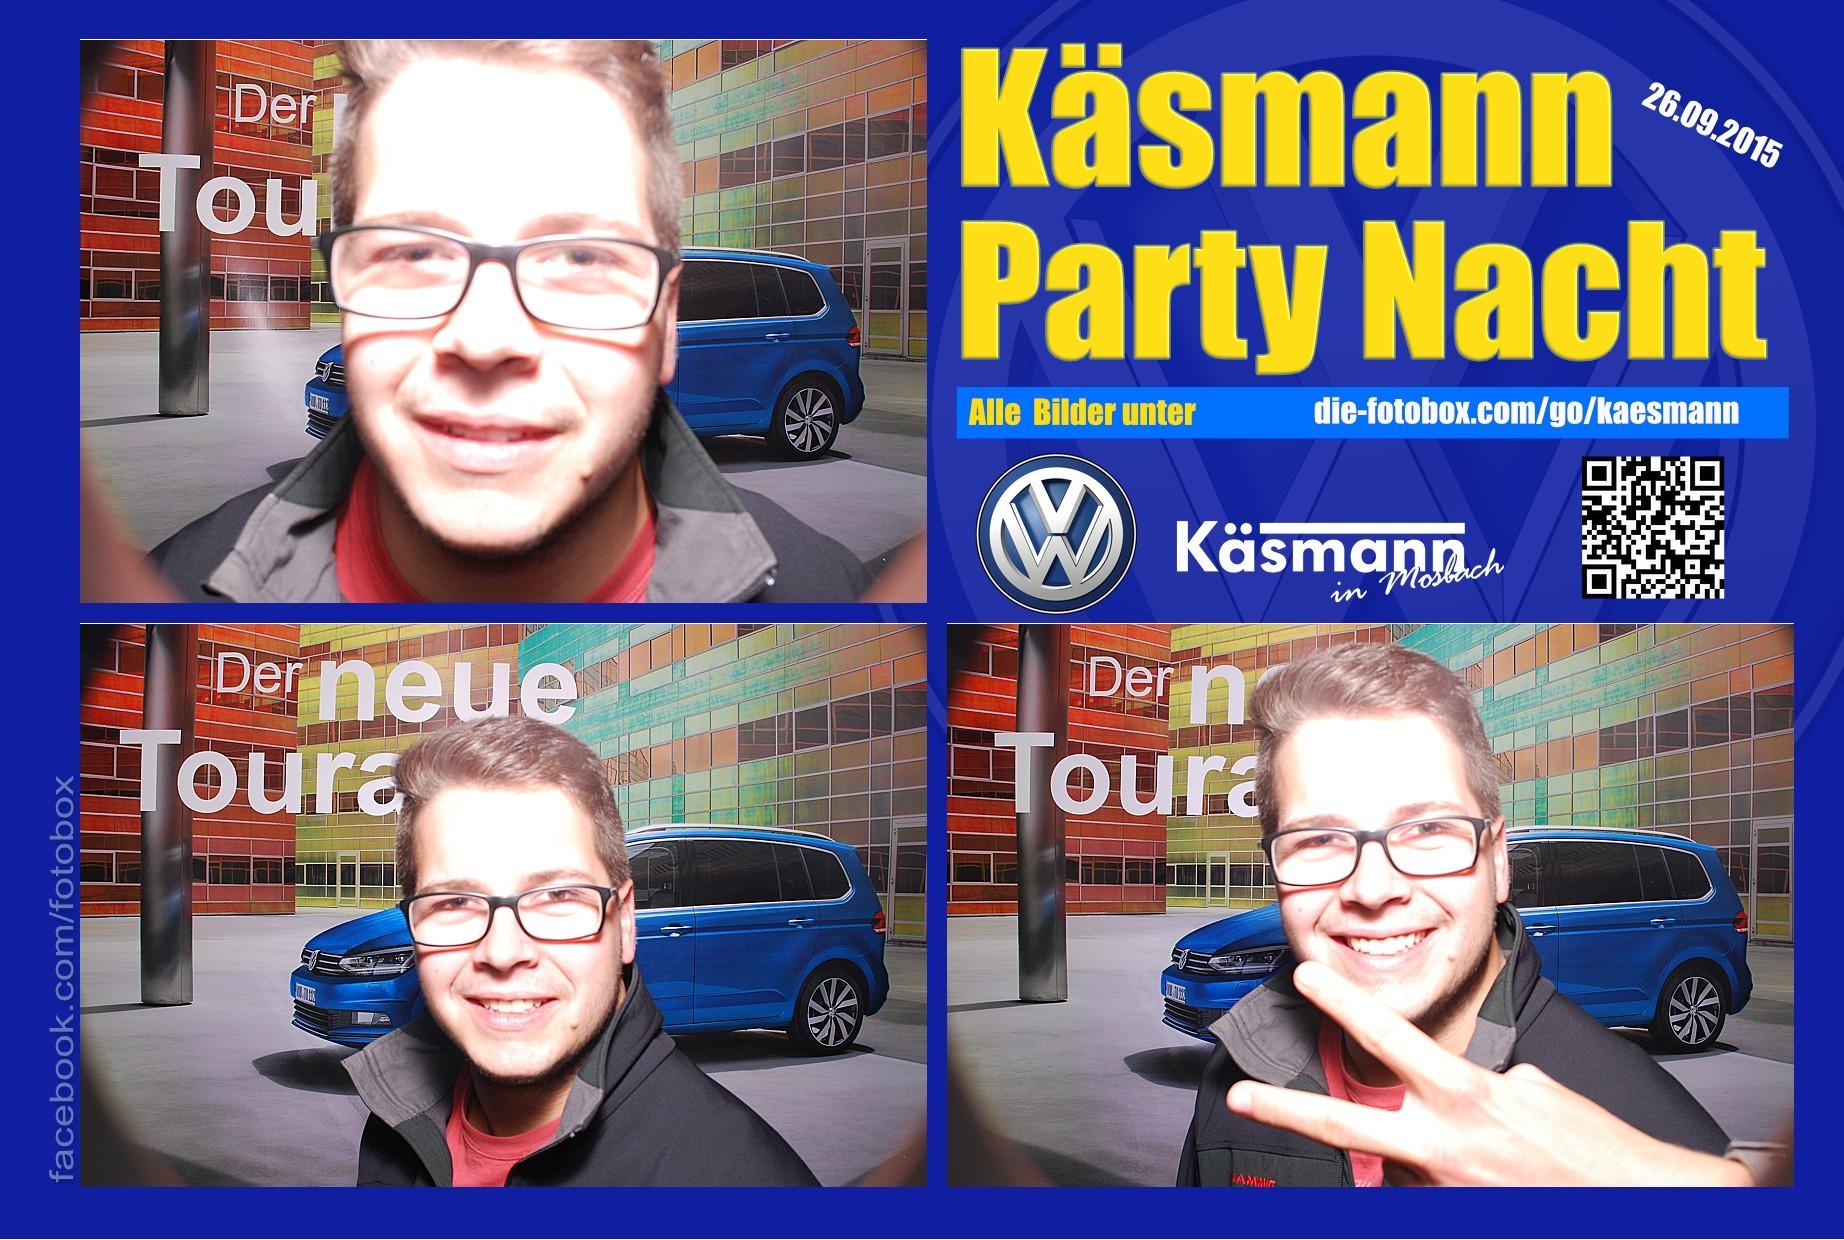 Käsmannparty 2015 - www.die-fotobox.com 01212